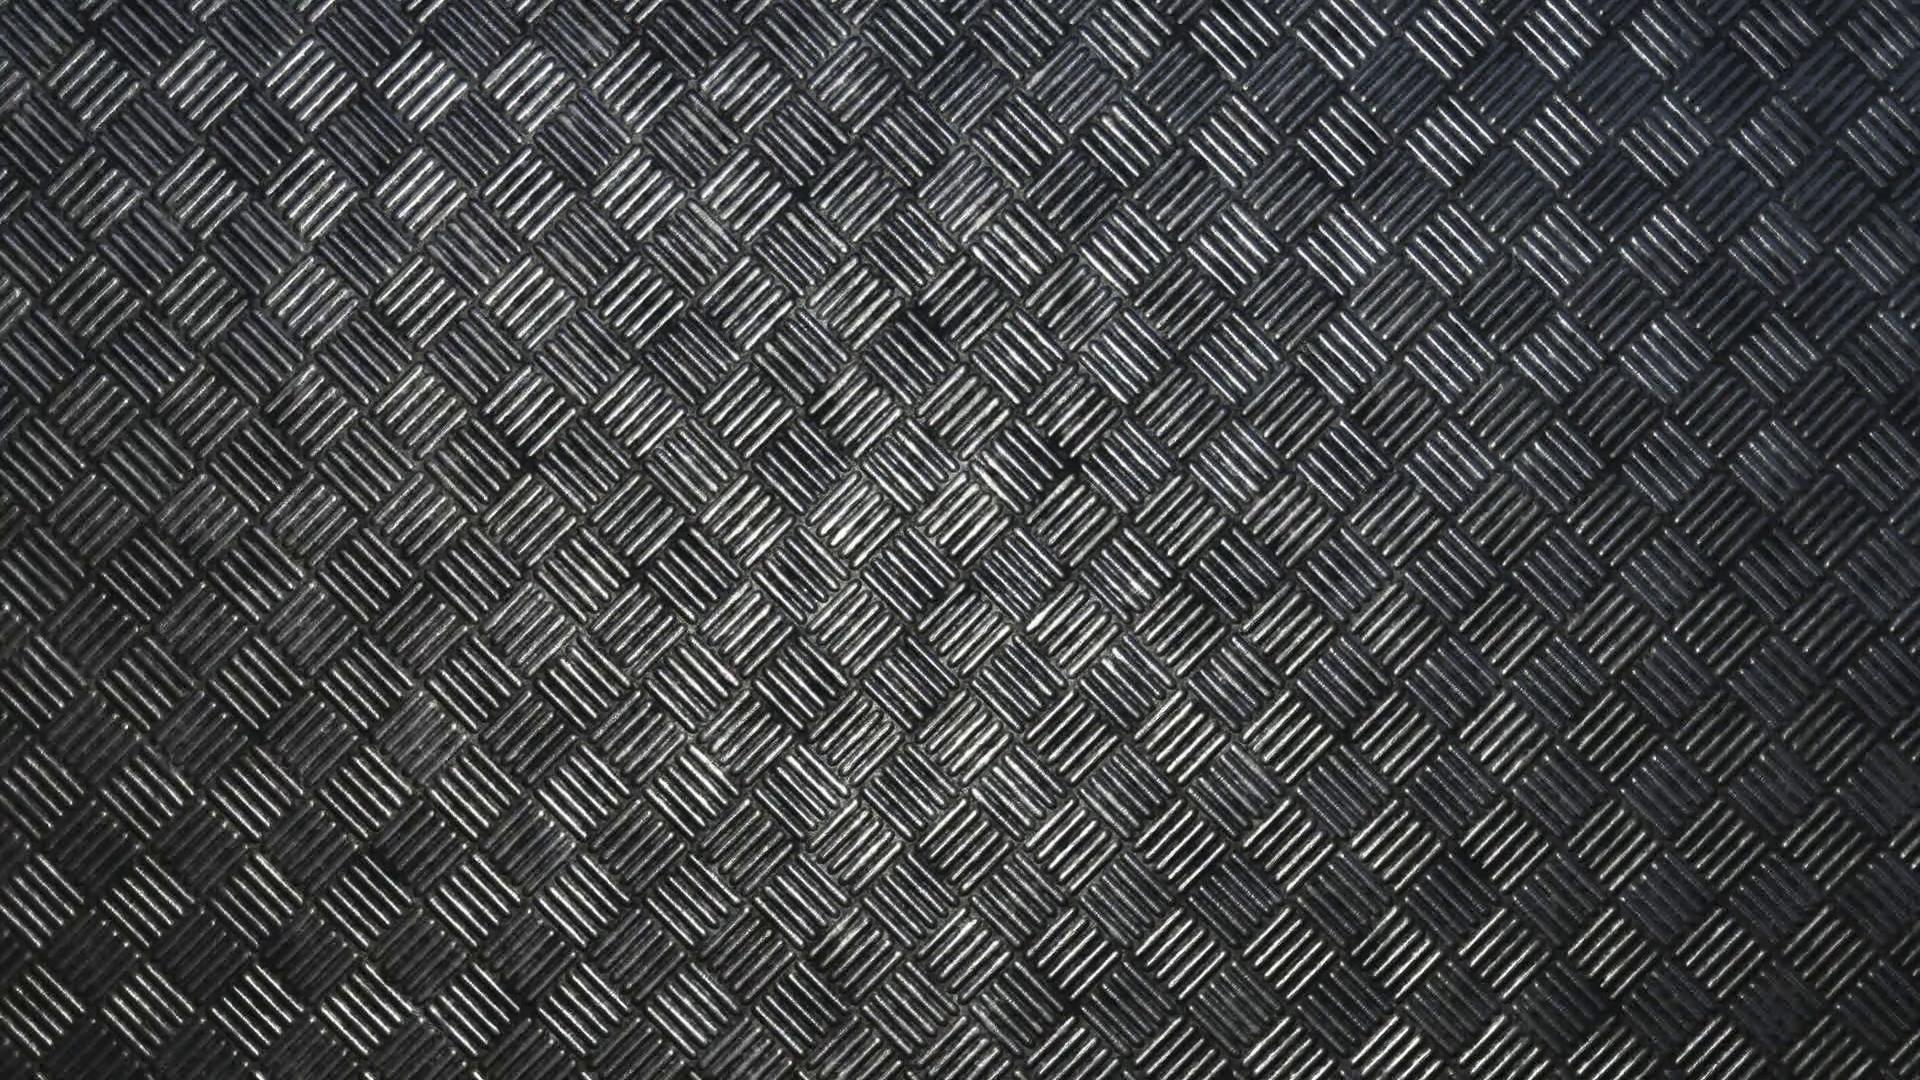 Dark Steel Square Pattern Texture Background Seamless Loop 3d Animation B8qsjj 7x Thumbnail Full01